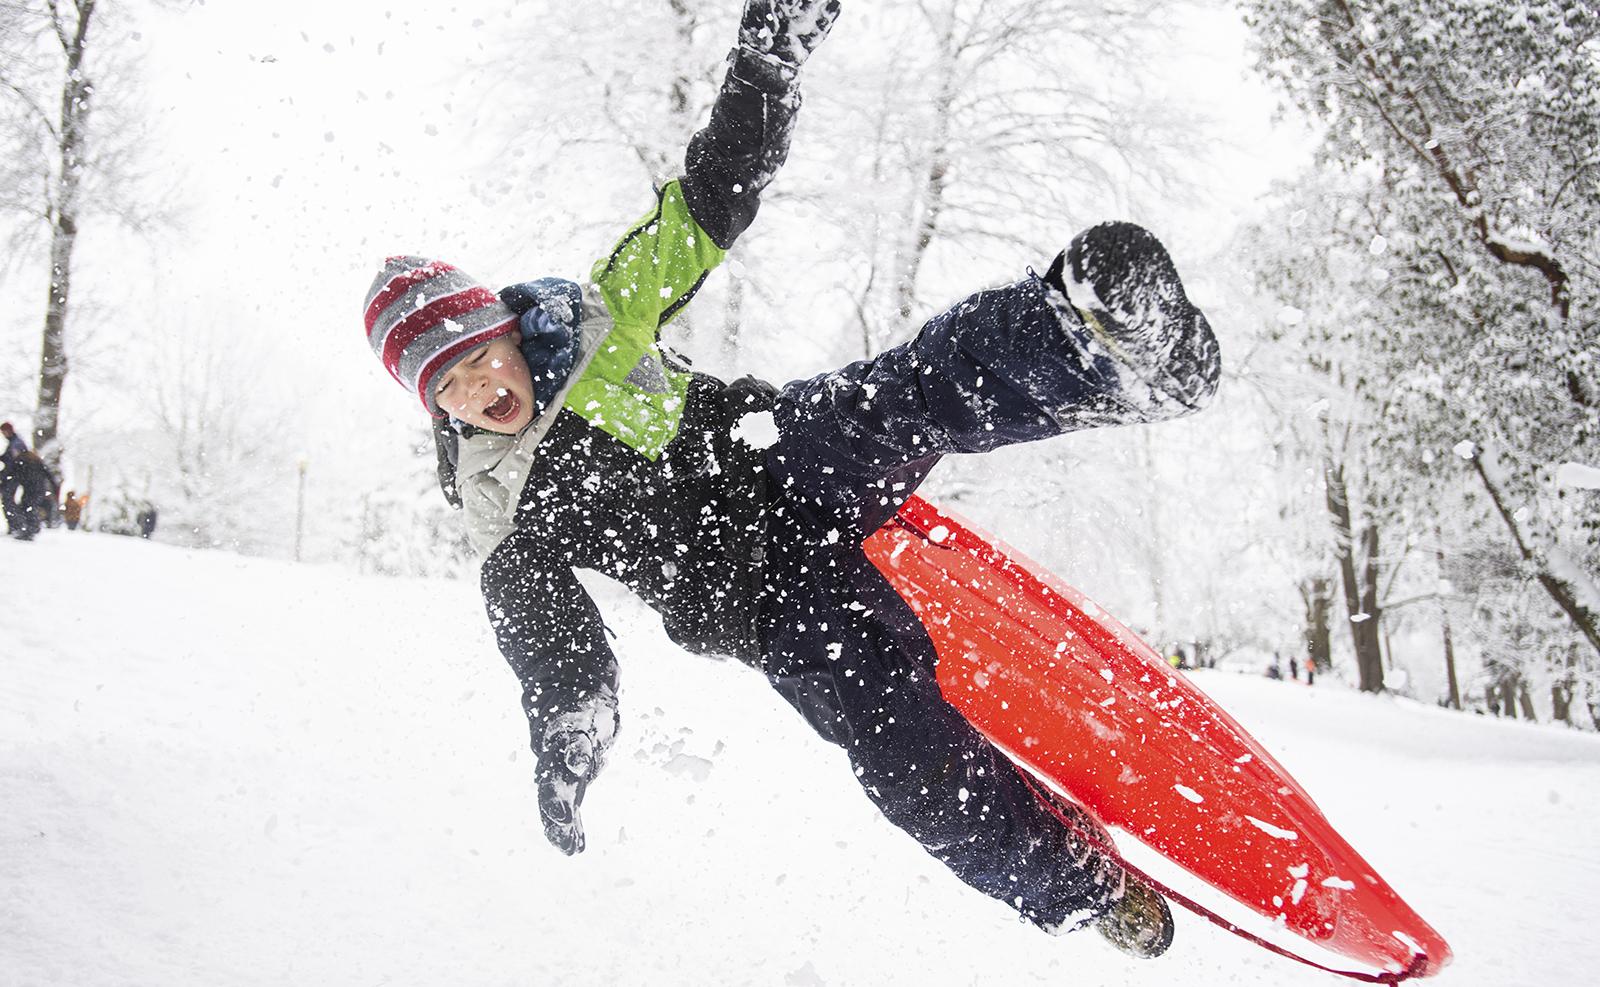 Fun in the snow, sledding for everyone